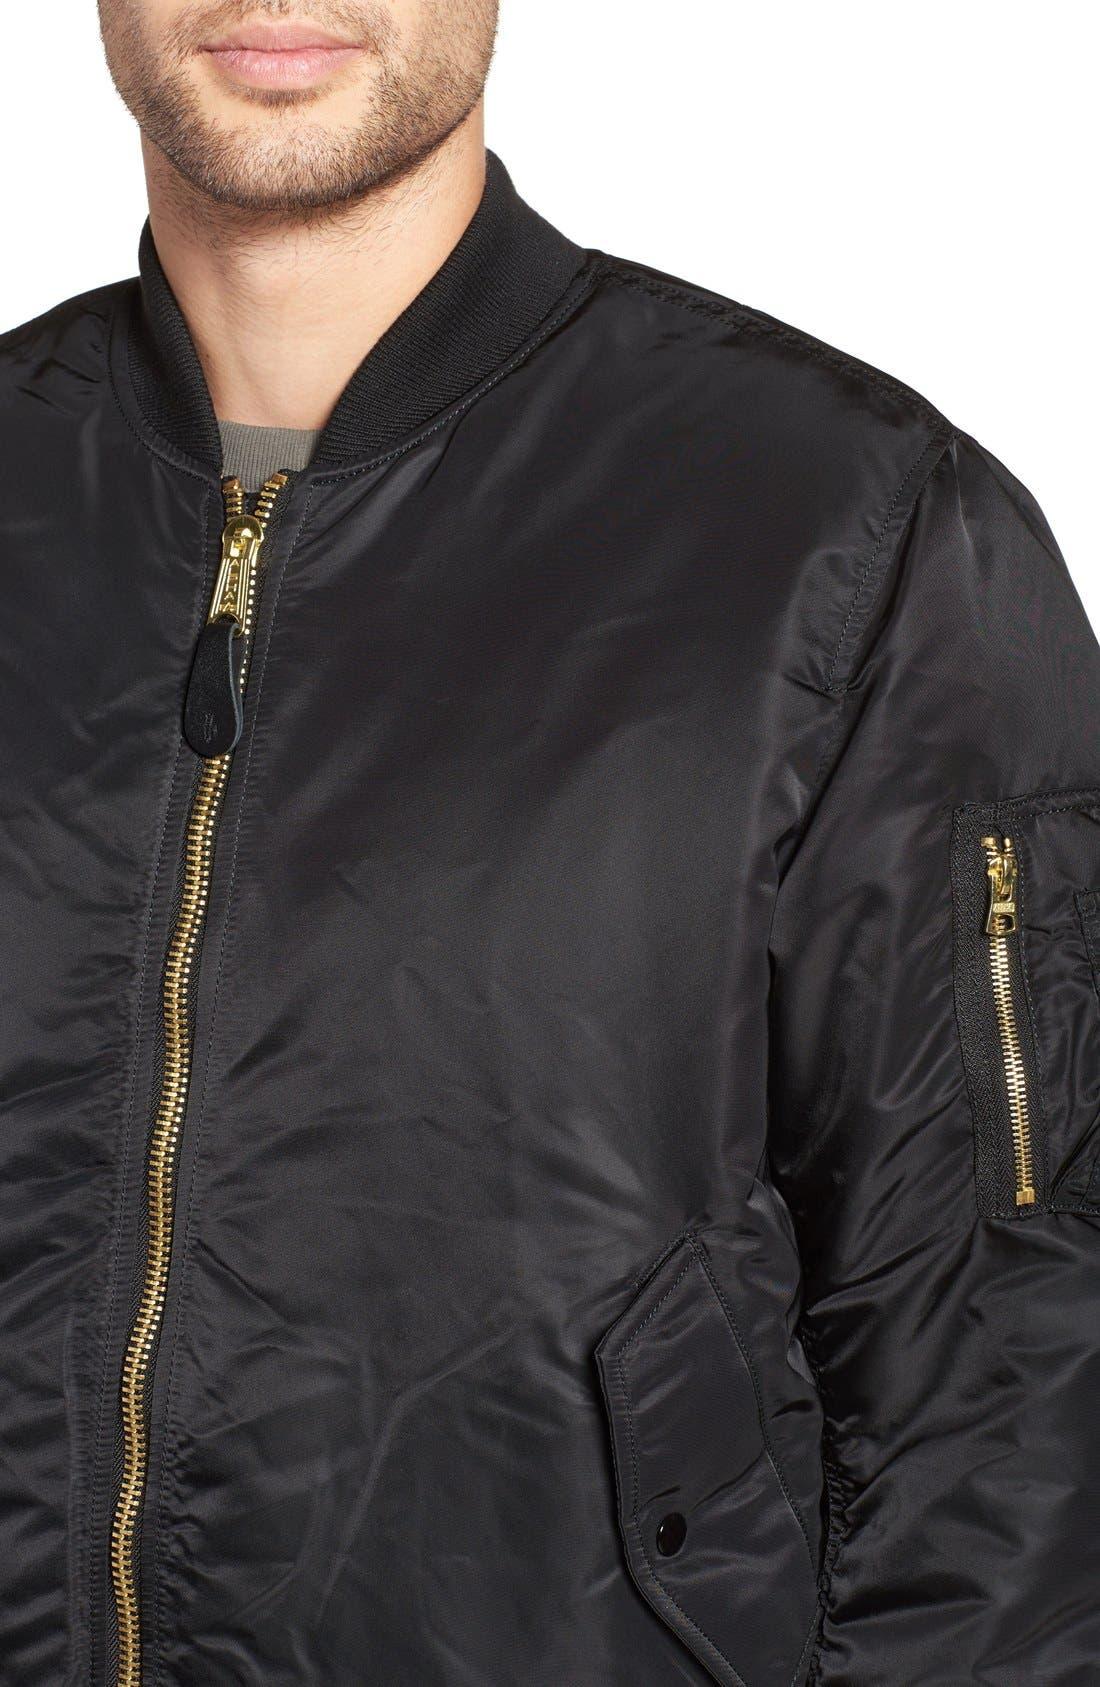 'MA-1' Slim Fit Bomber Jacket,                             Alternate thumbnail 2, color,                             BLACK